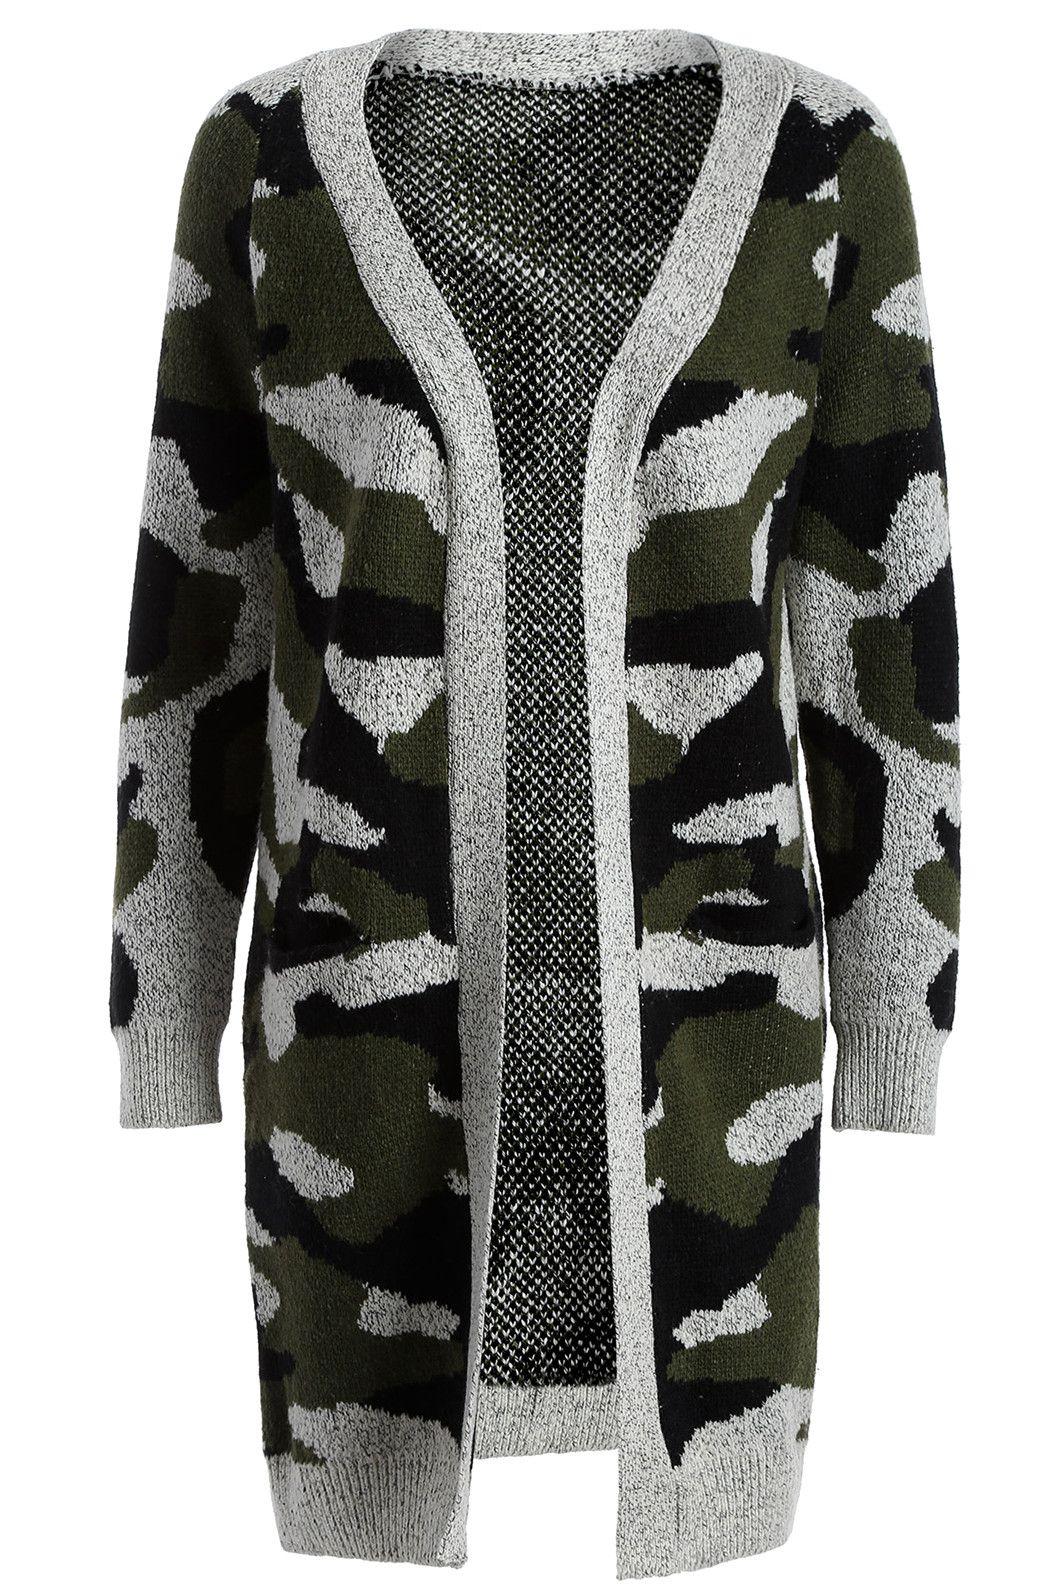 $19.86 Camo Print Long Knitted Cardigan | Fashion | Pinterest ...